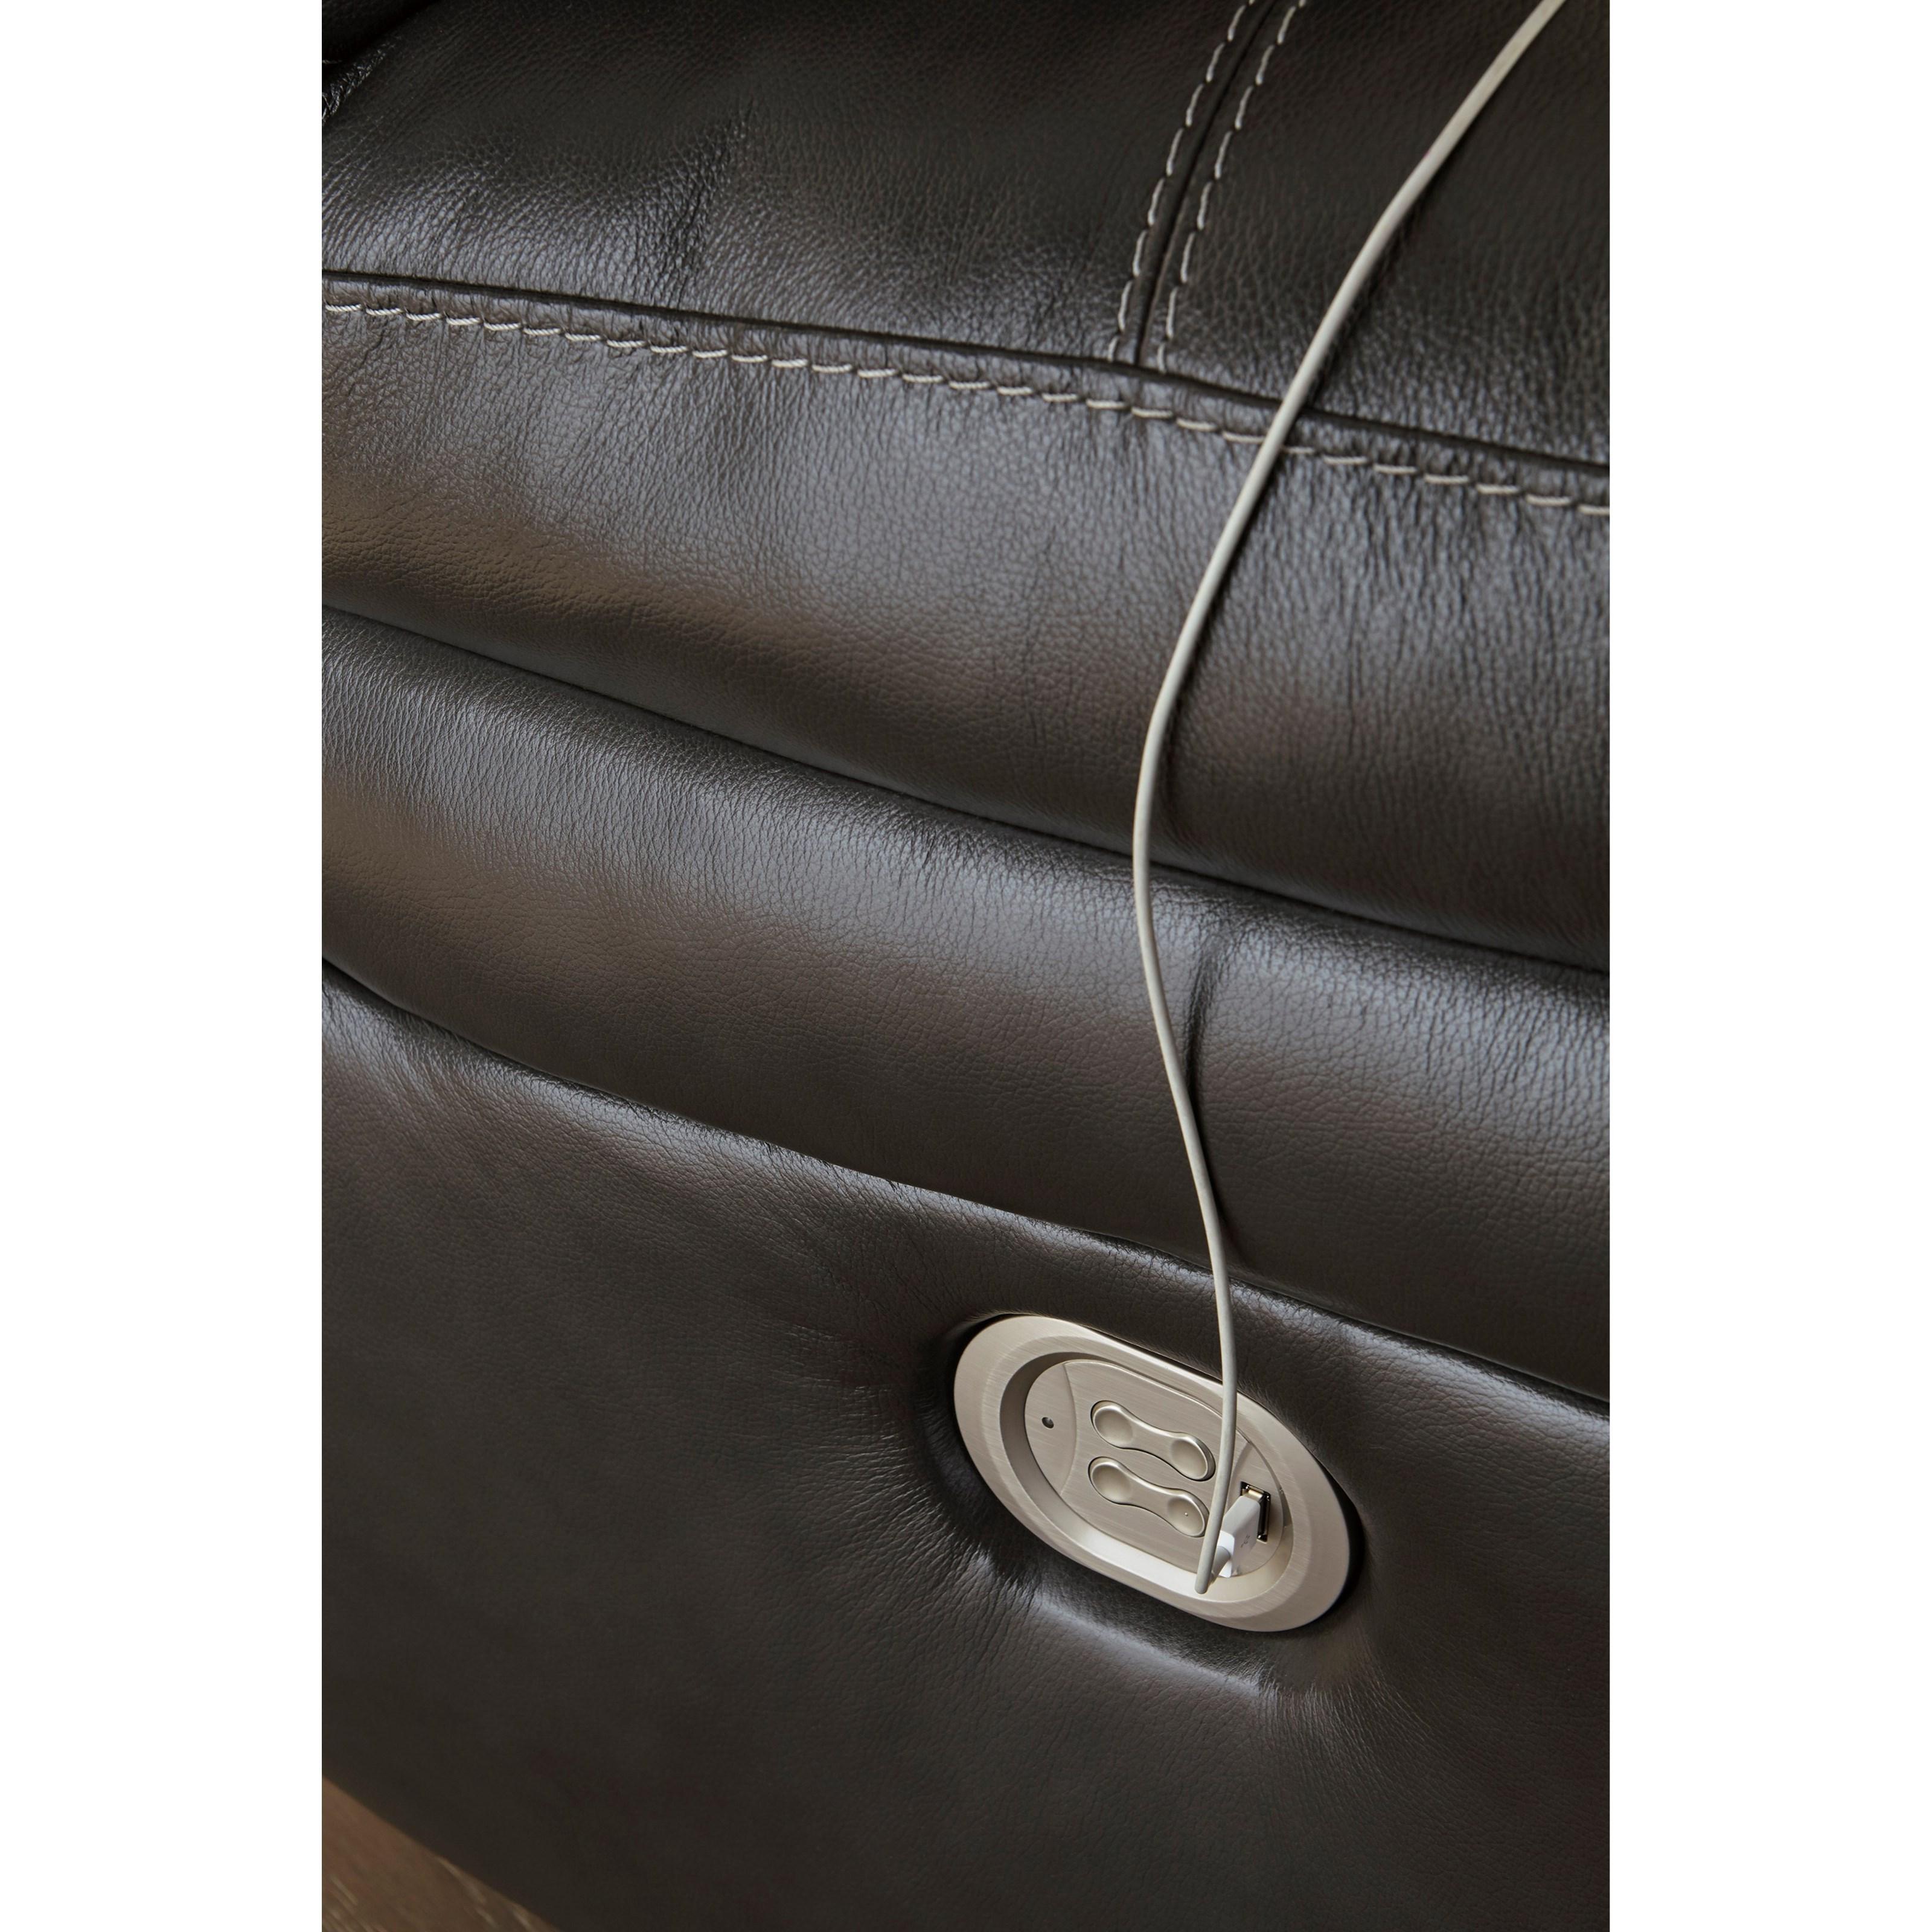 Ashley Furniture Outlet Wausau: Signature Design By Ashley Hallstrung U5240382 Leather